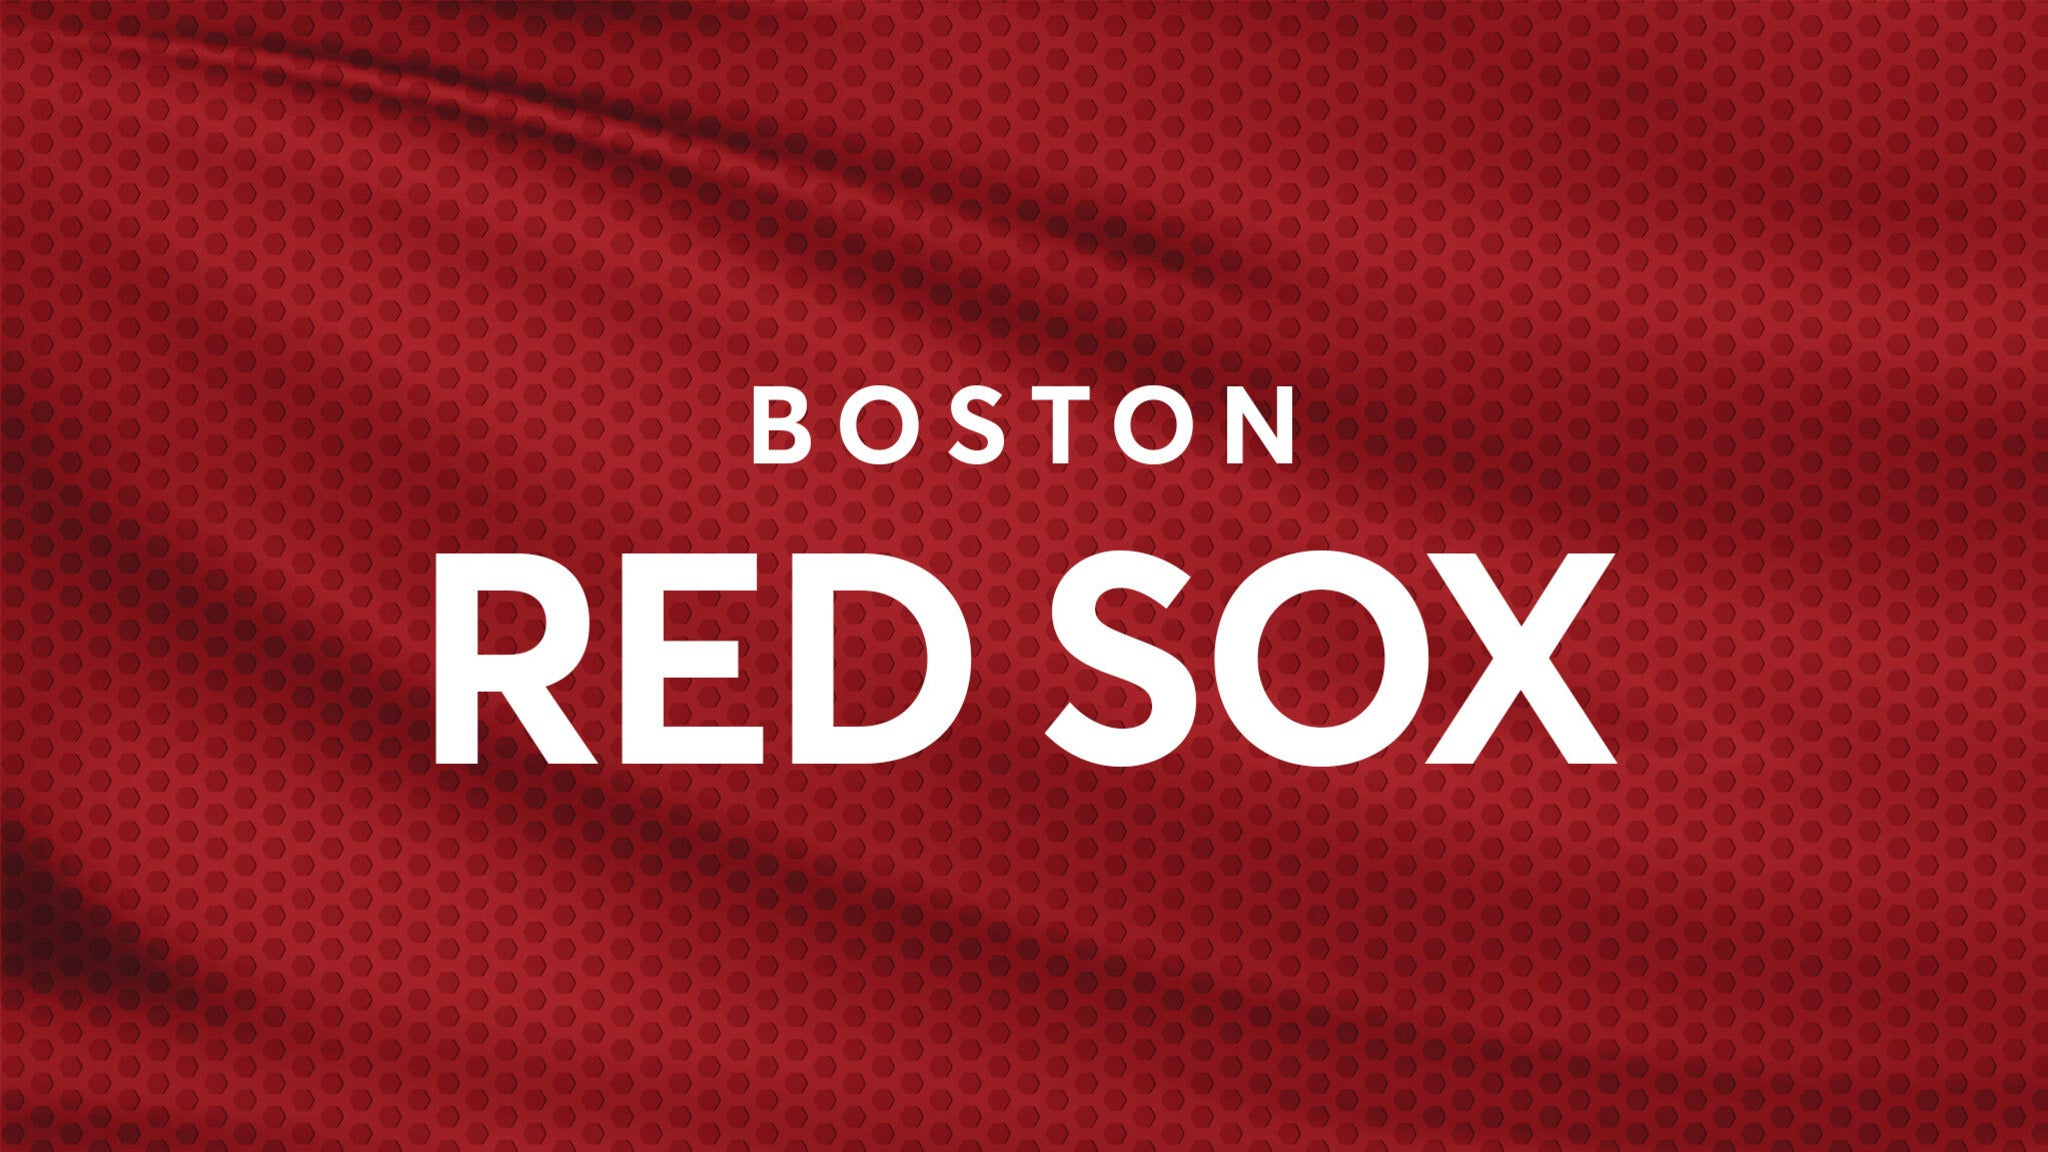 Boston Red Sox vs. Oakland Athletics